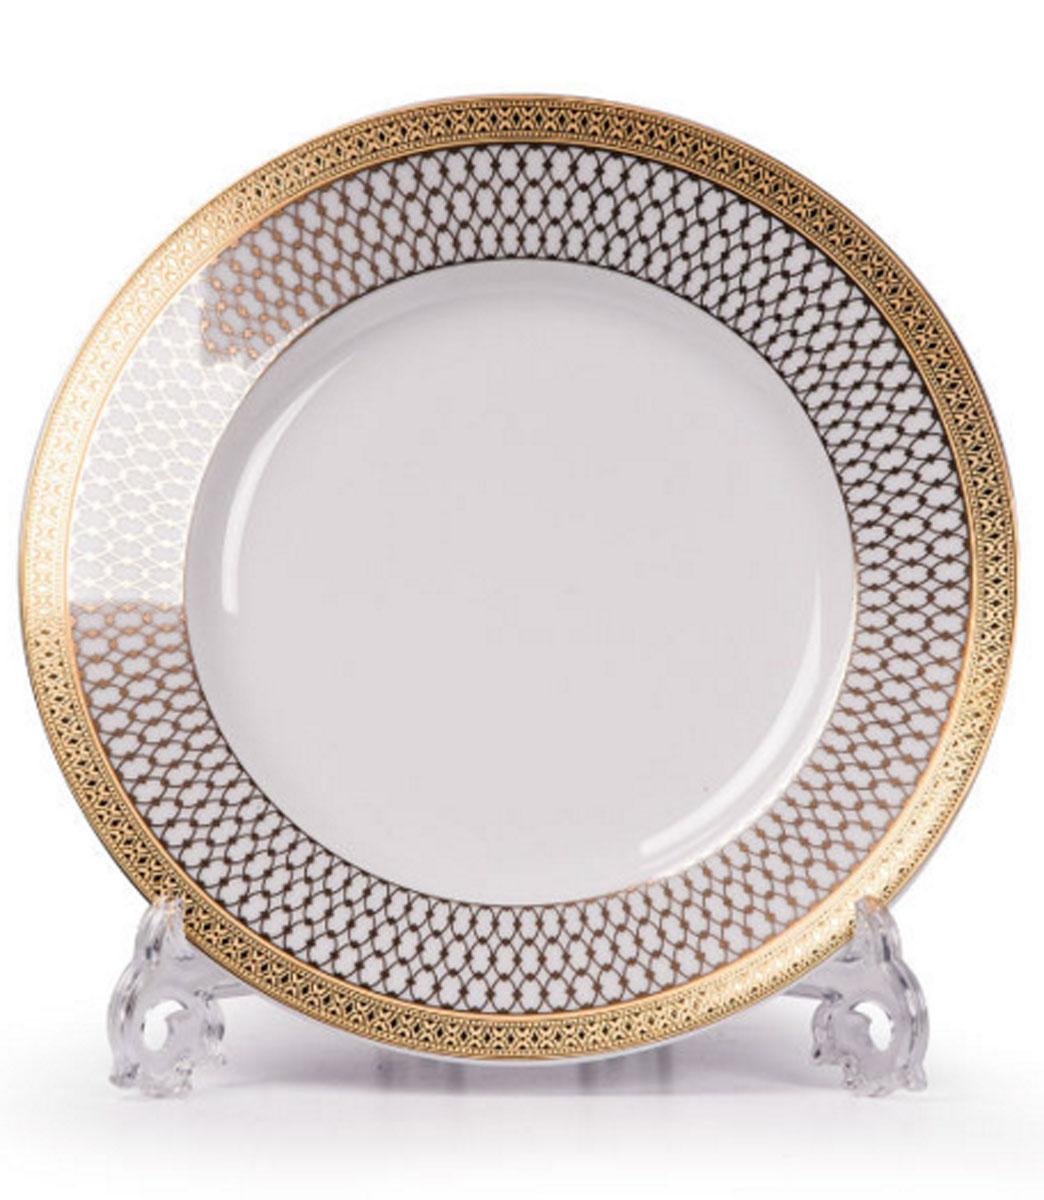 Mimosa Victoire Or 1488, набор тарелок 22см (6шт), цвет: белый с золотомVT-1520(SR)В наборе тарелка 22 см 6 штук Материал: фарфор: цвет: белый с золотомСерия: TANIT